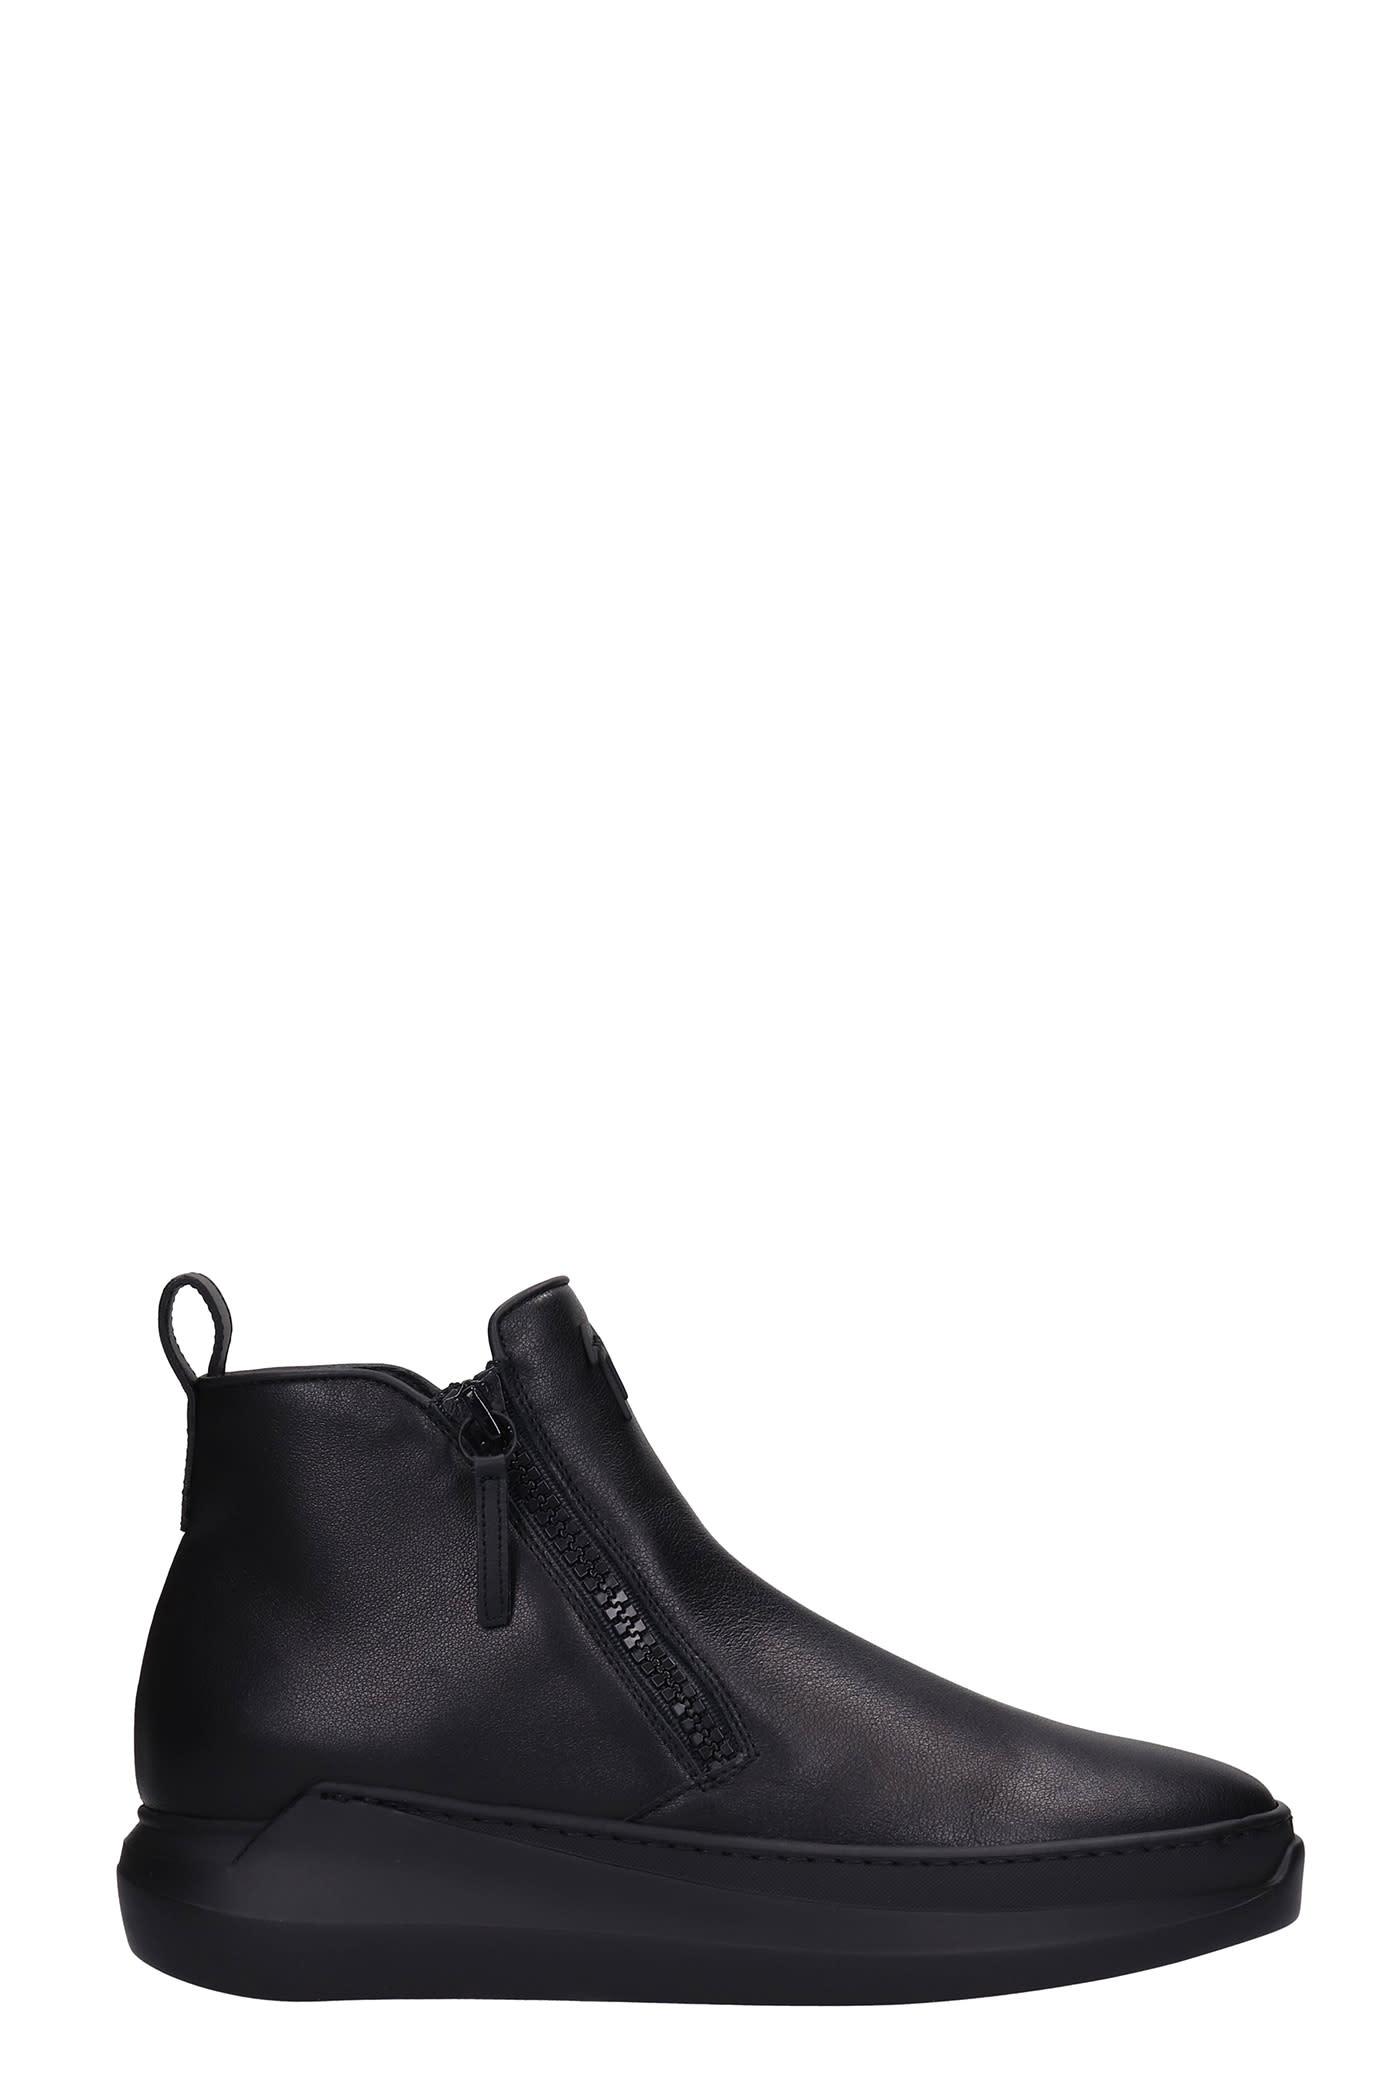 Giuseppe Zanotti Conley Zip Sneakers In Black Leather